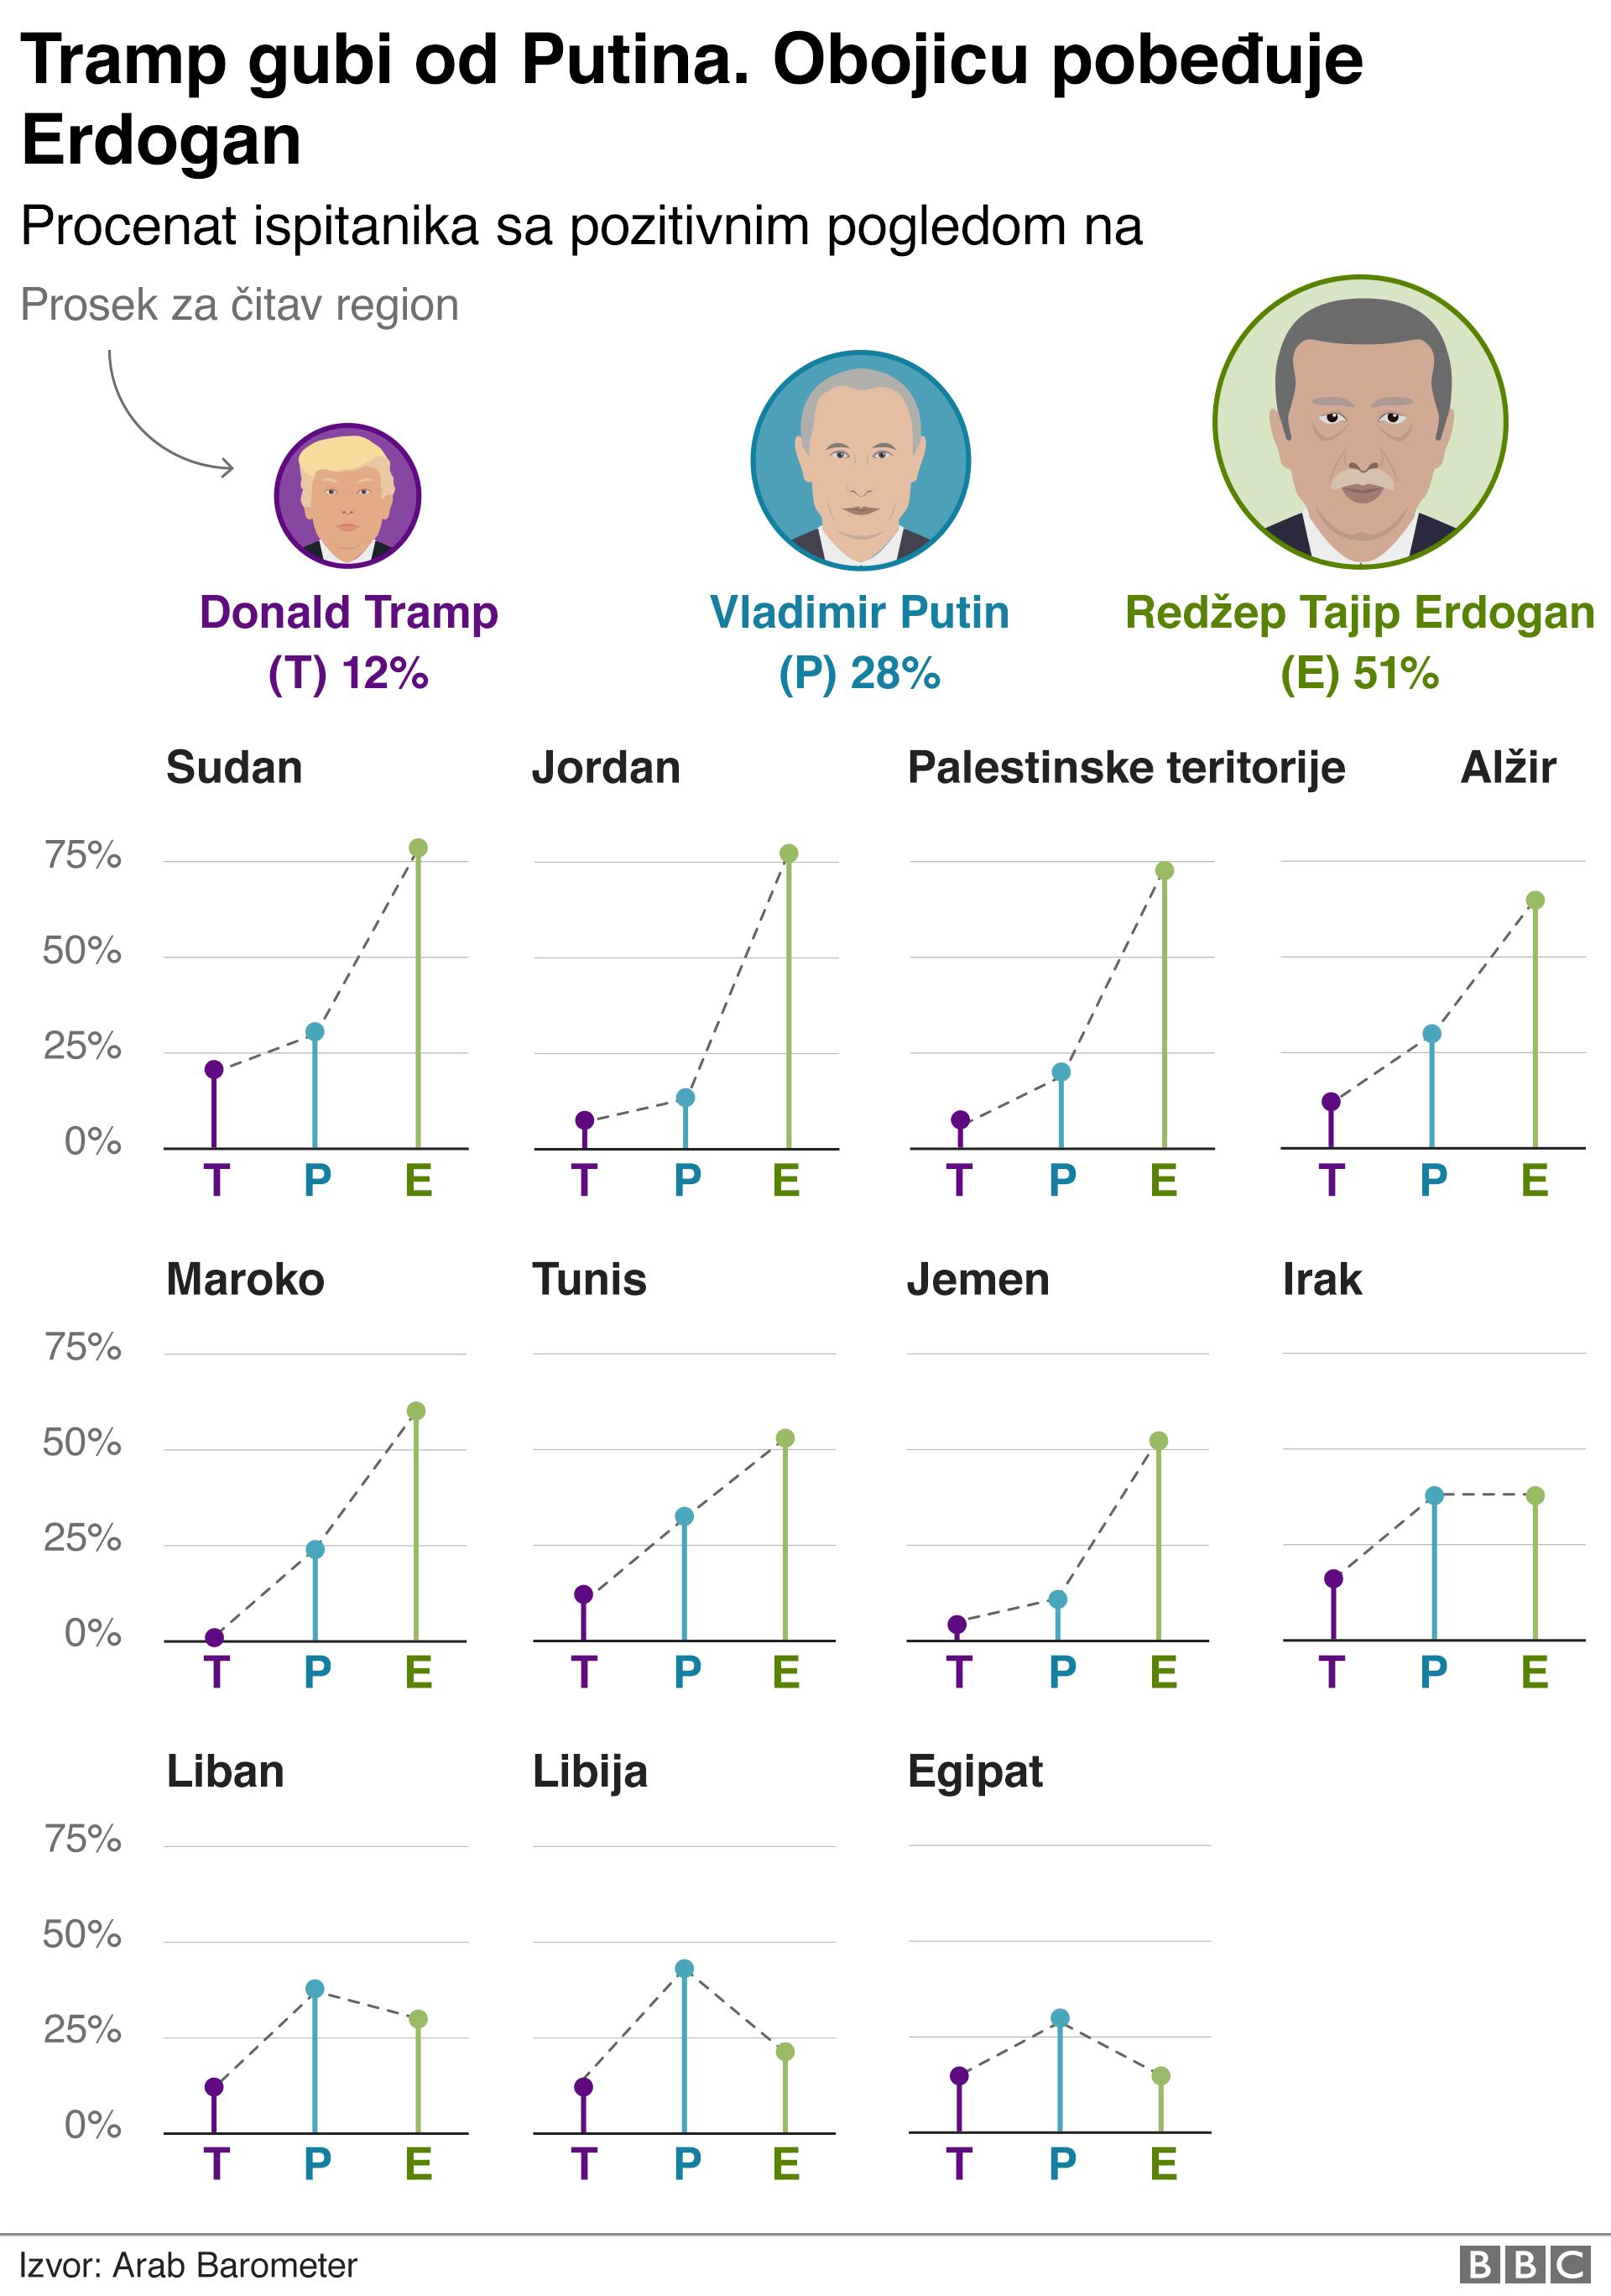 tramp, putin ili erdogan